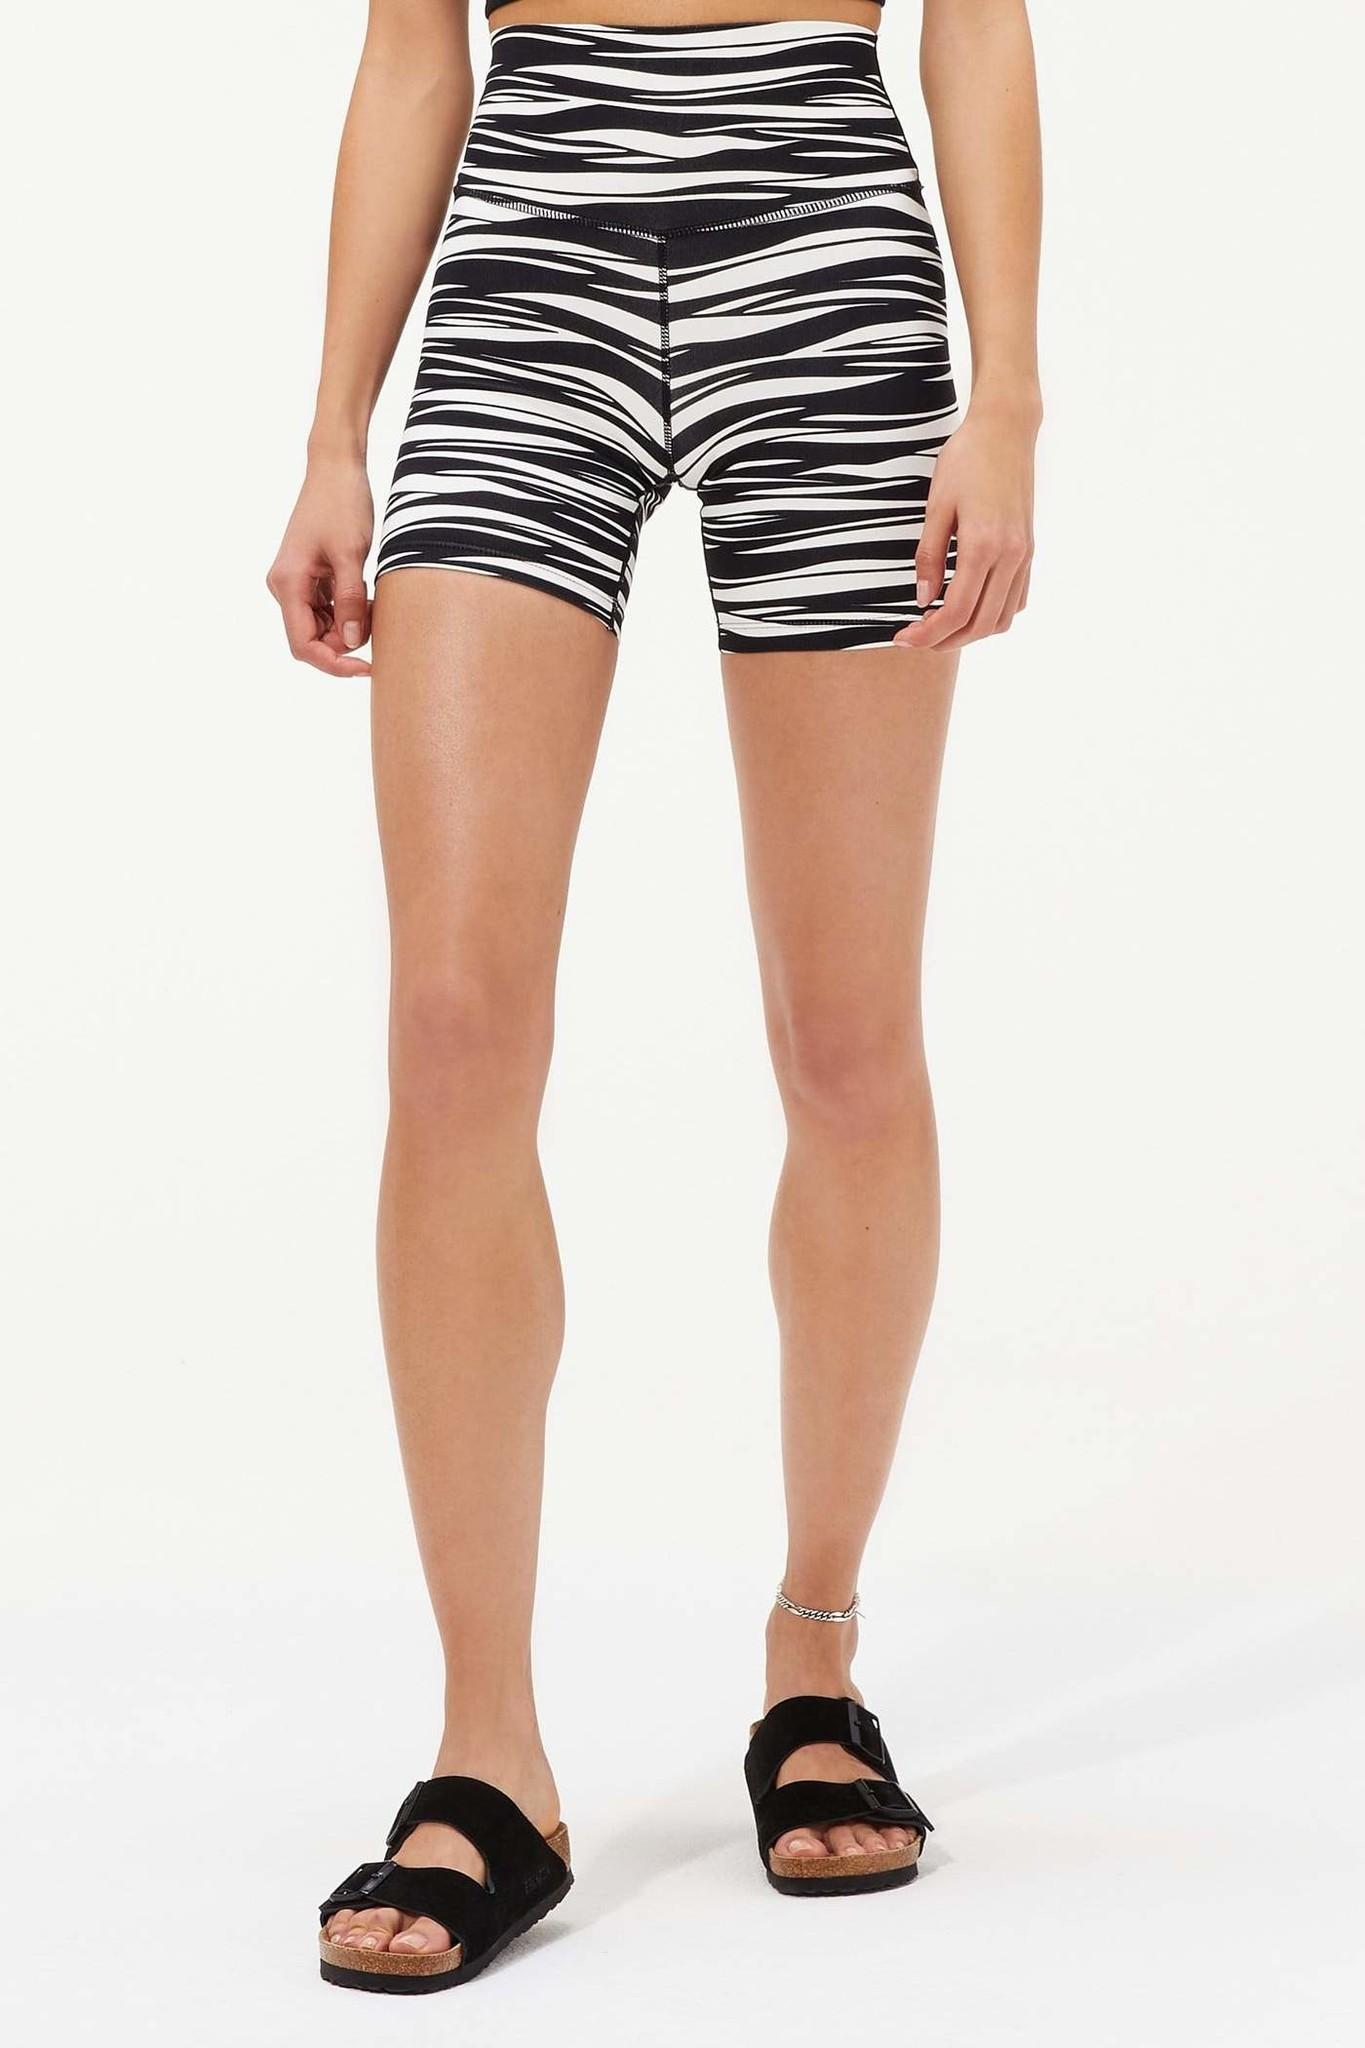 Splits59 Airweight High Waist Short Black Zebra